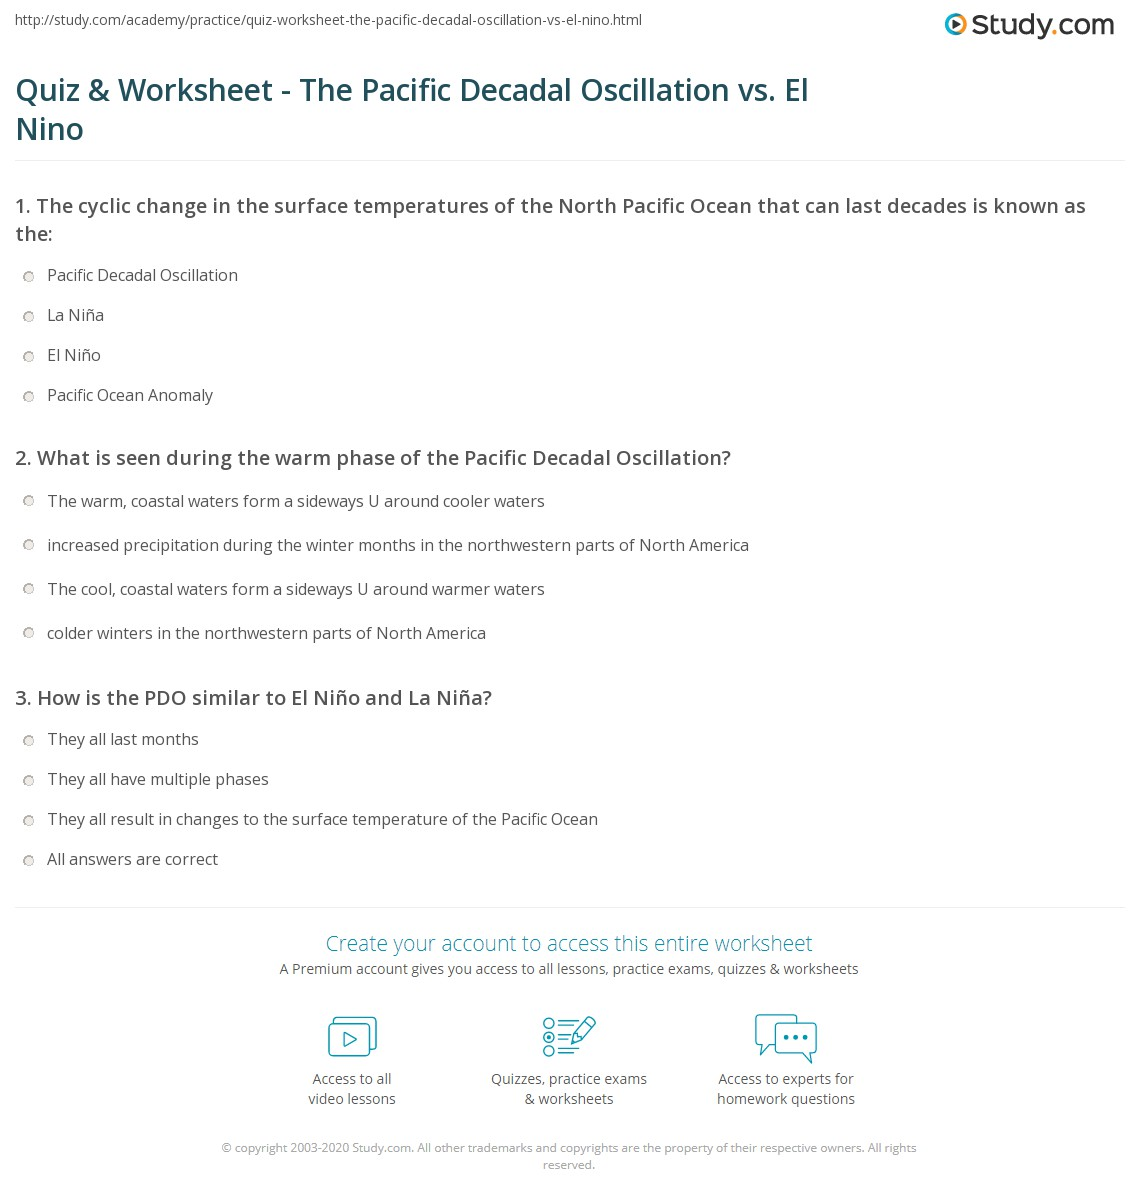 quiz worksheet the pacific decadal oscillation vs el nino. Black Bedroom Furniture Sets. Home Design Ideas